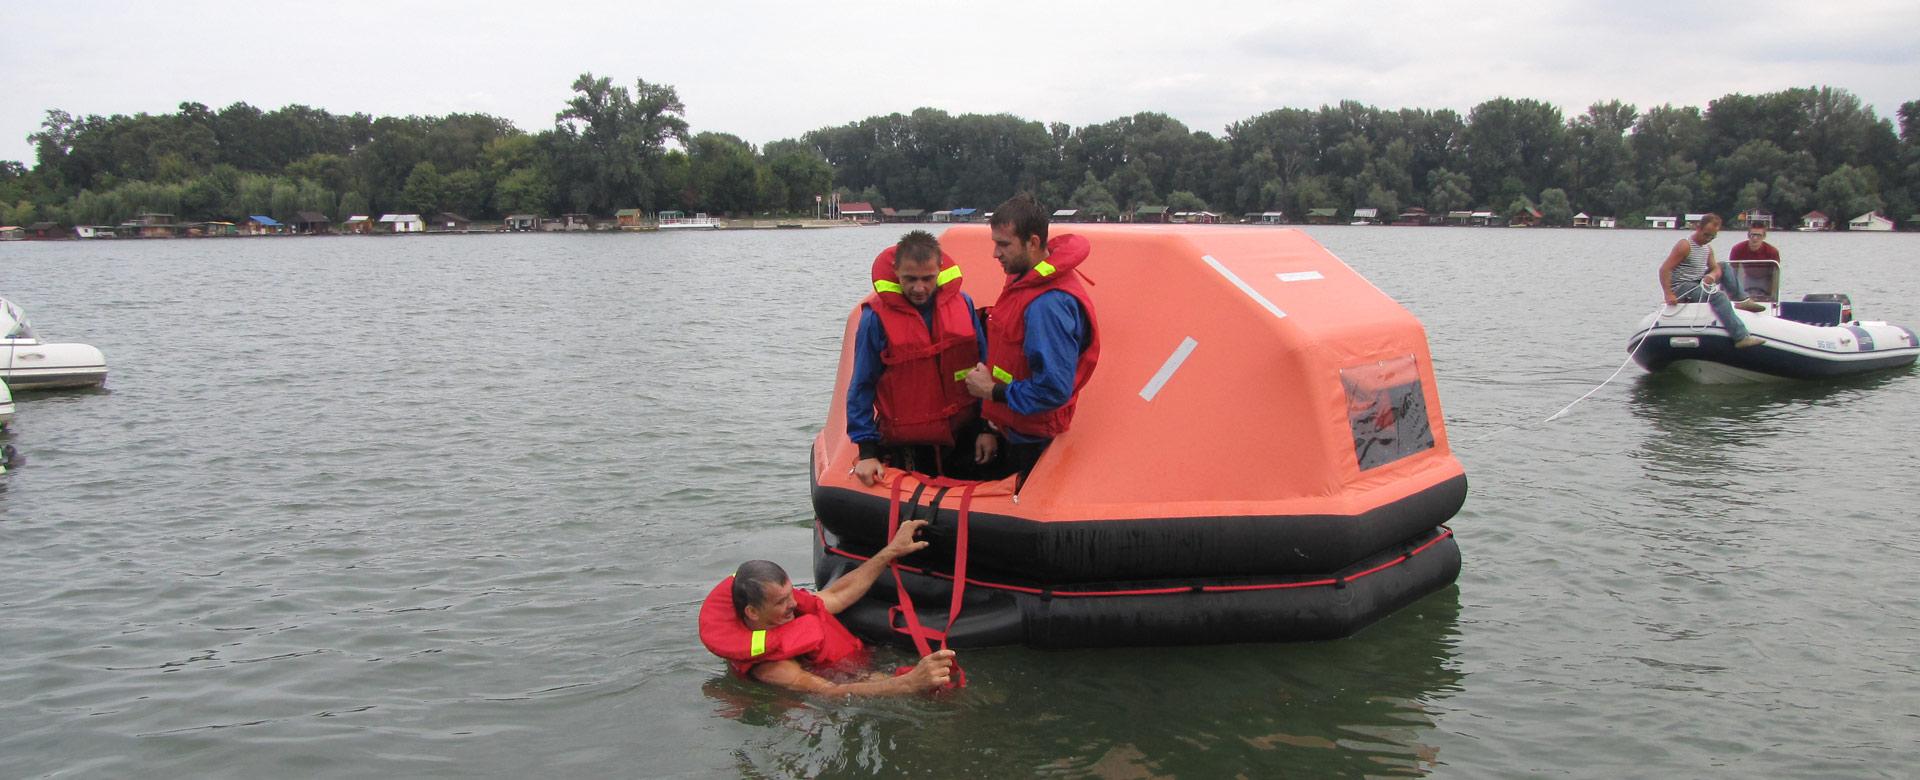 life-raft-slider-2